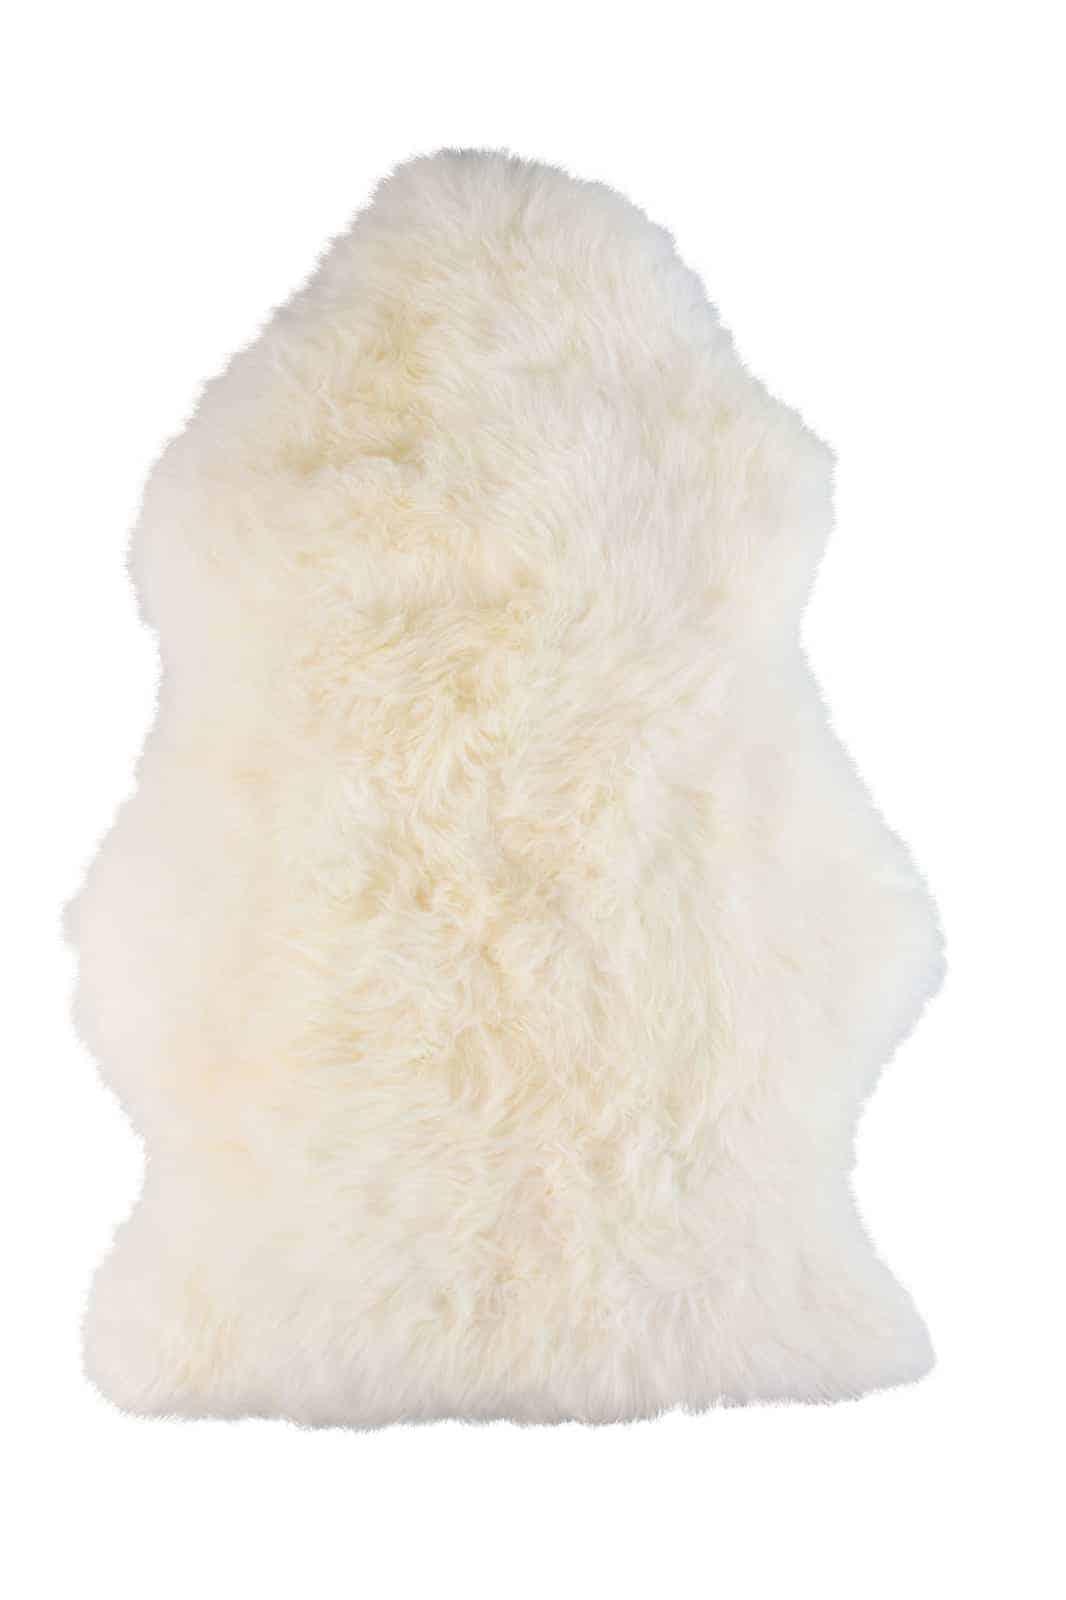 ivory fluffy rug